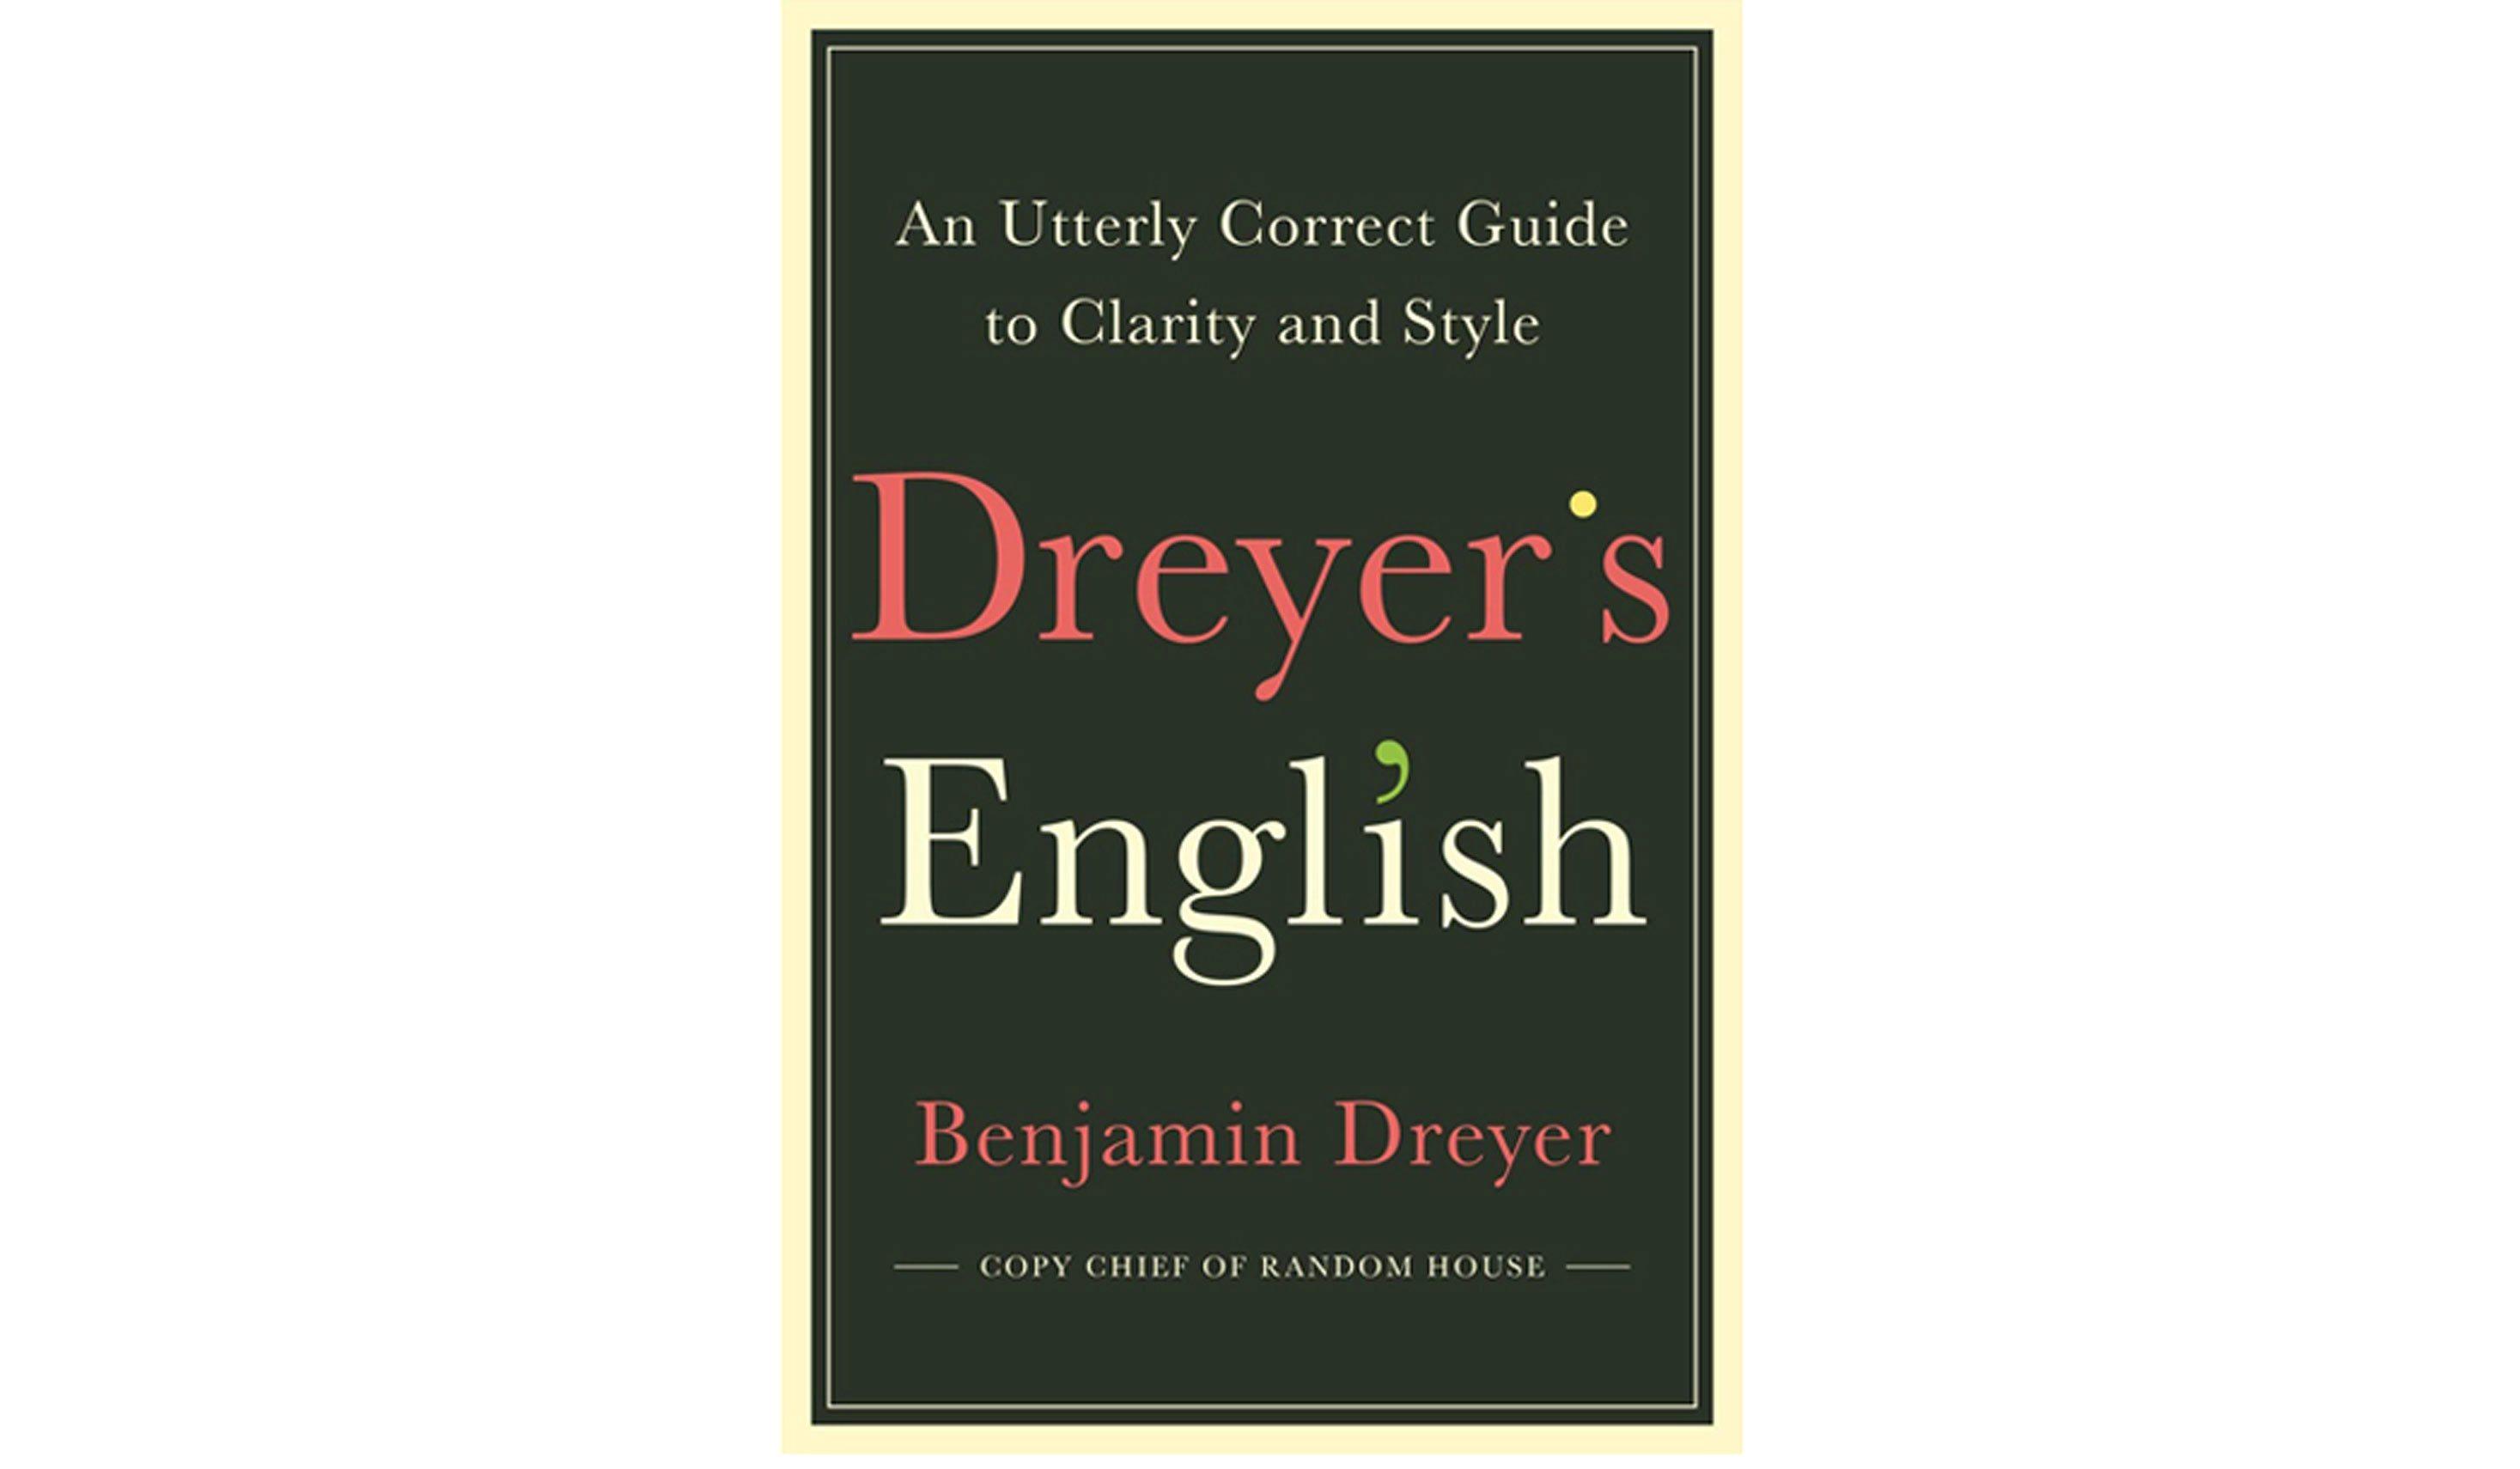 In praise of good English